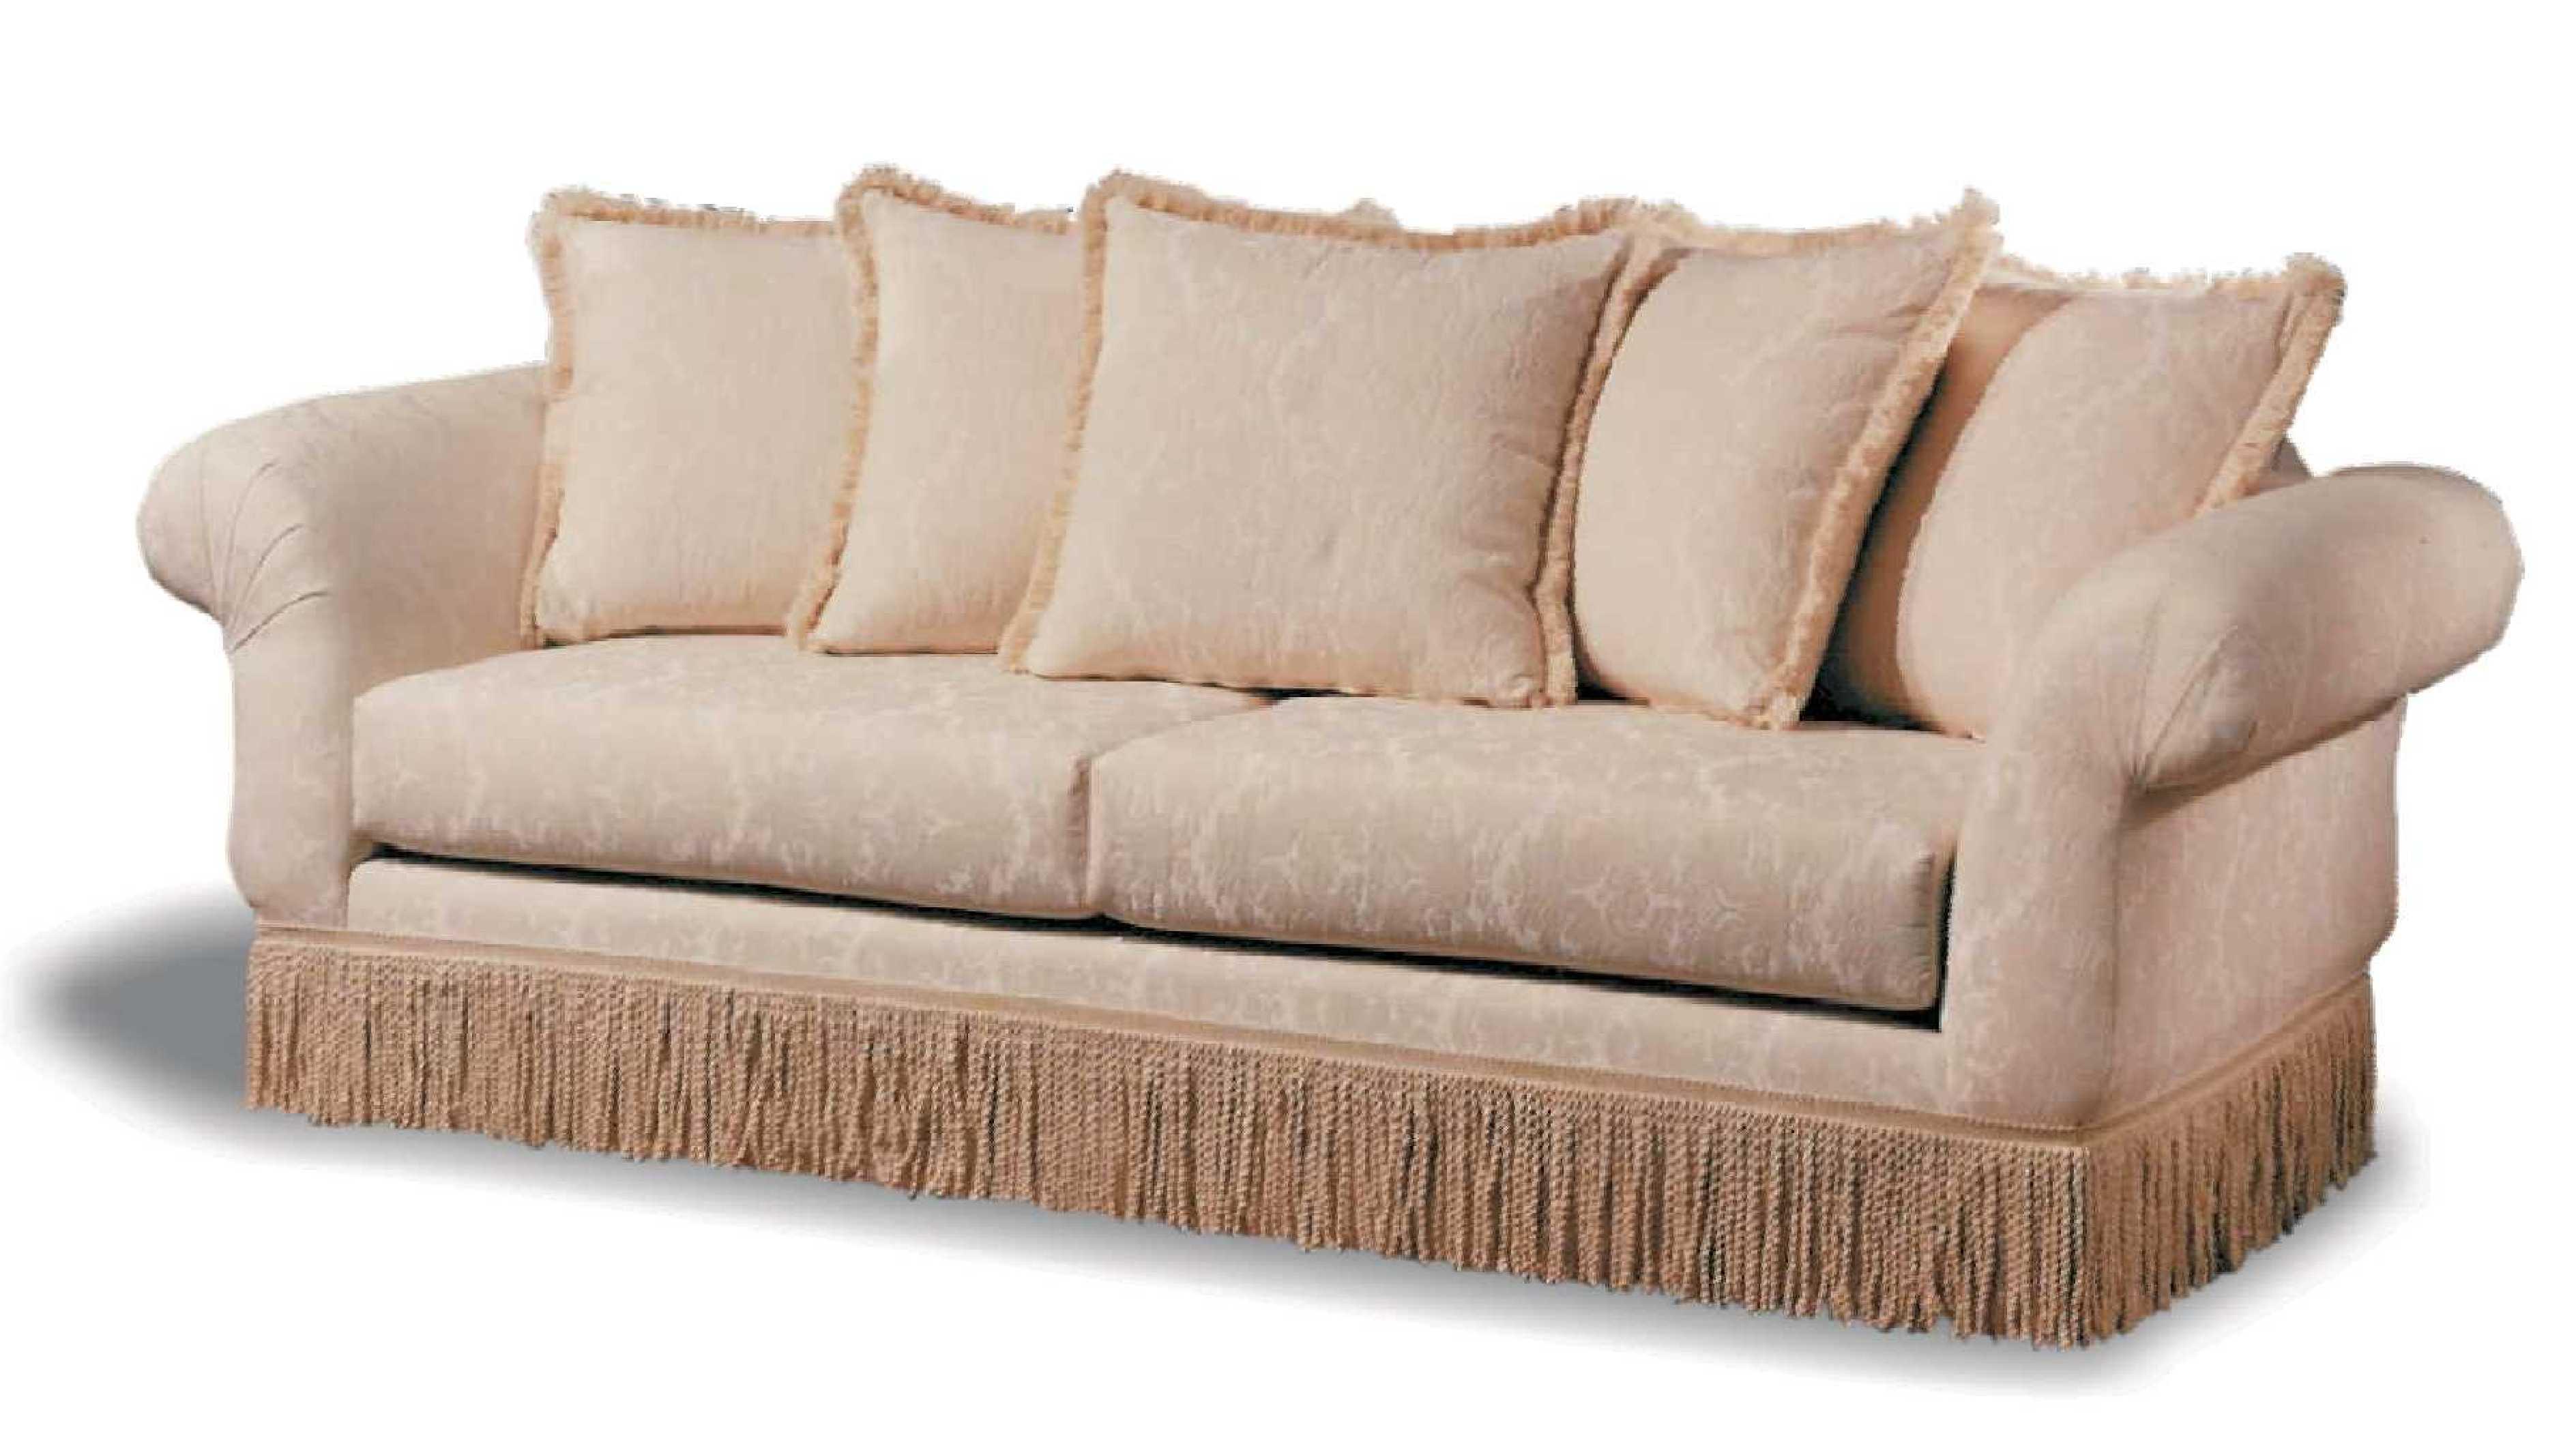 La cienega sofa factory for Factory sofas